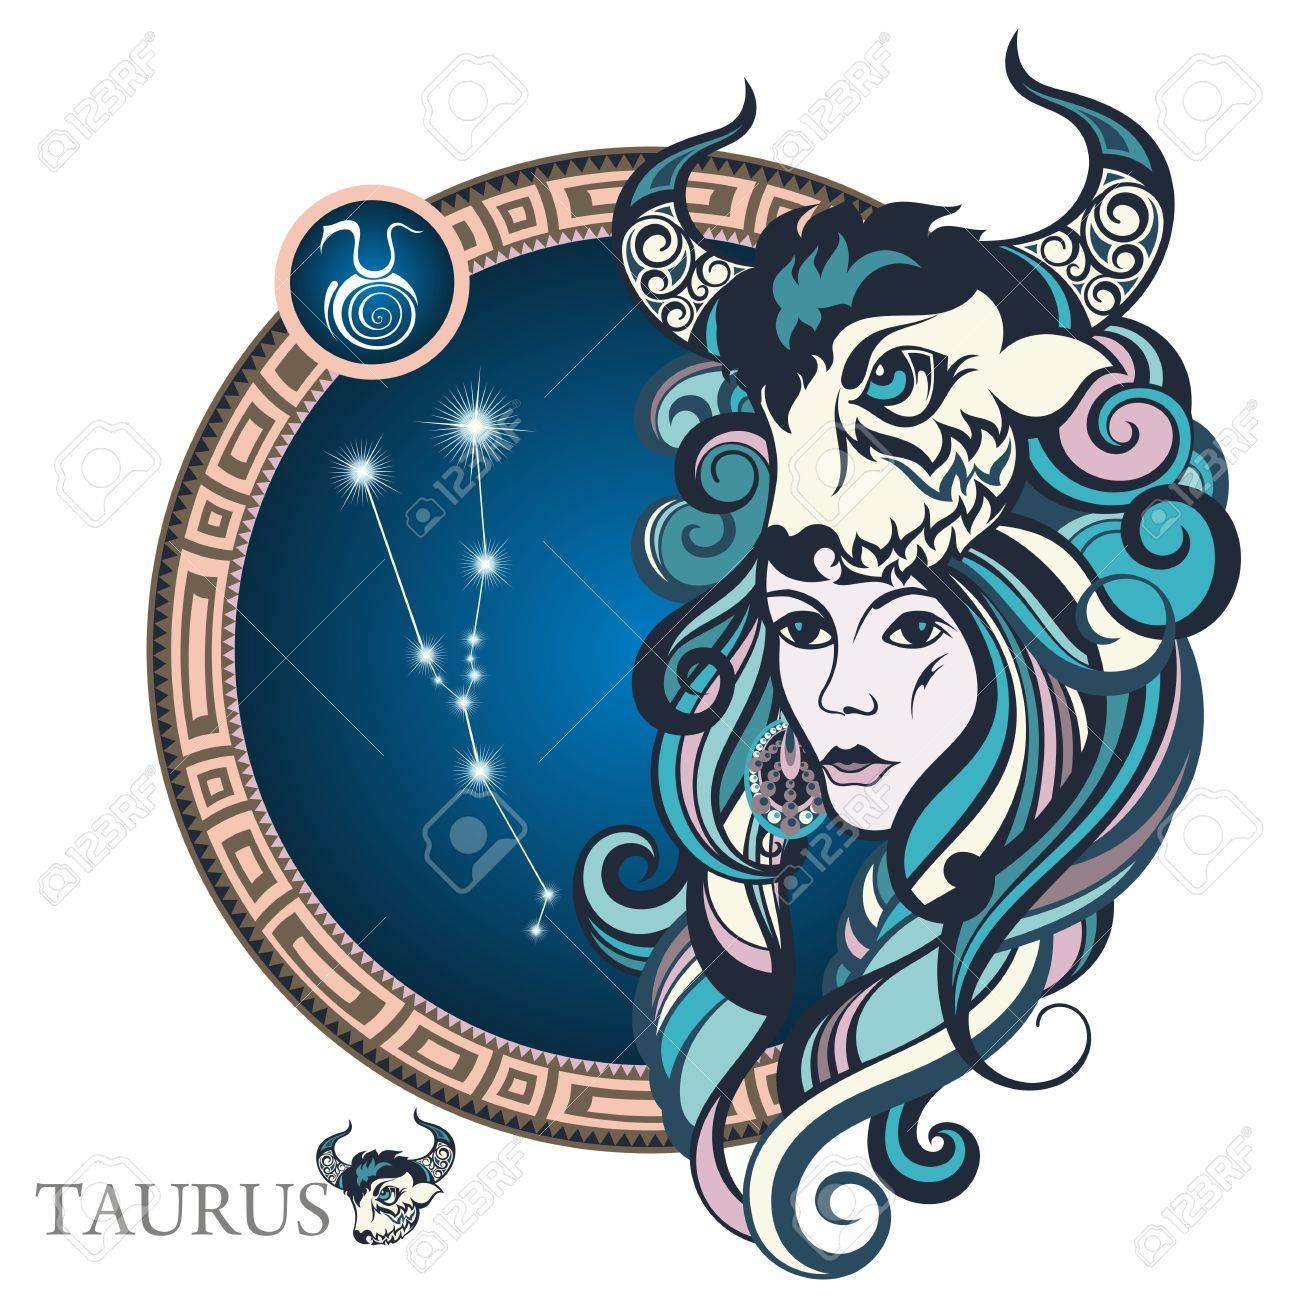 Taurus Zodiac Sign Royalty Free Cliparts Vectors And Stock Illustration Image 67462000